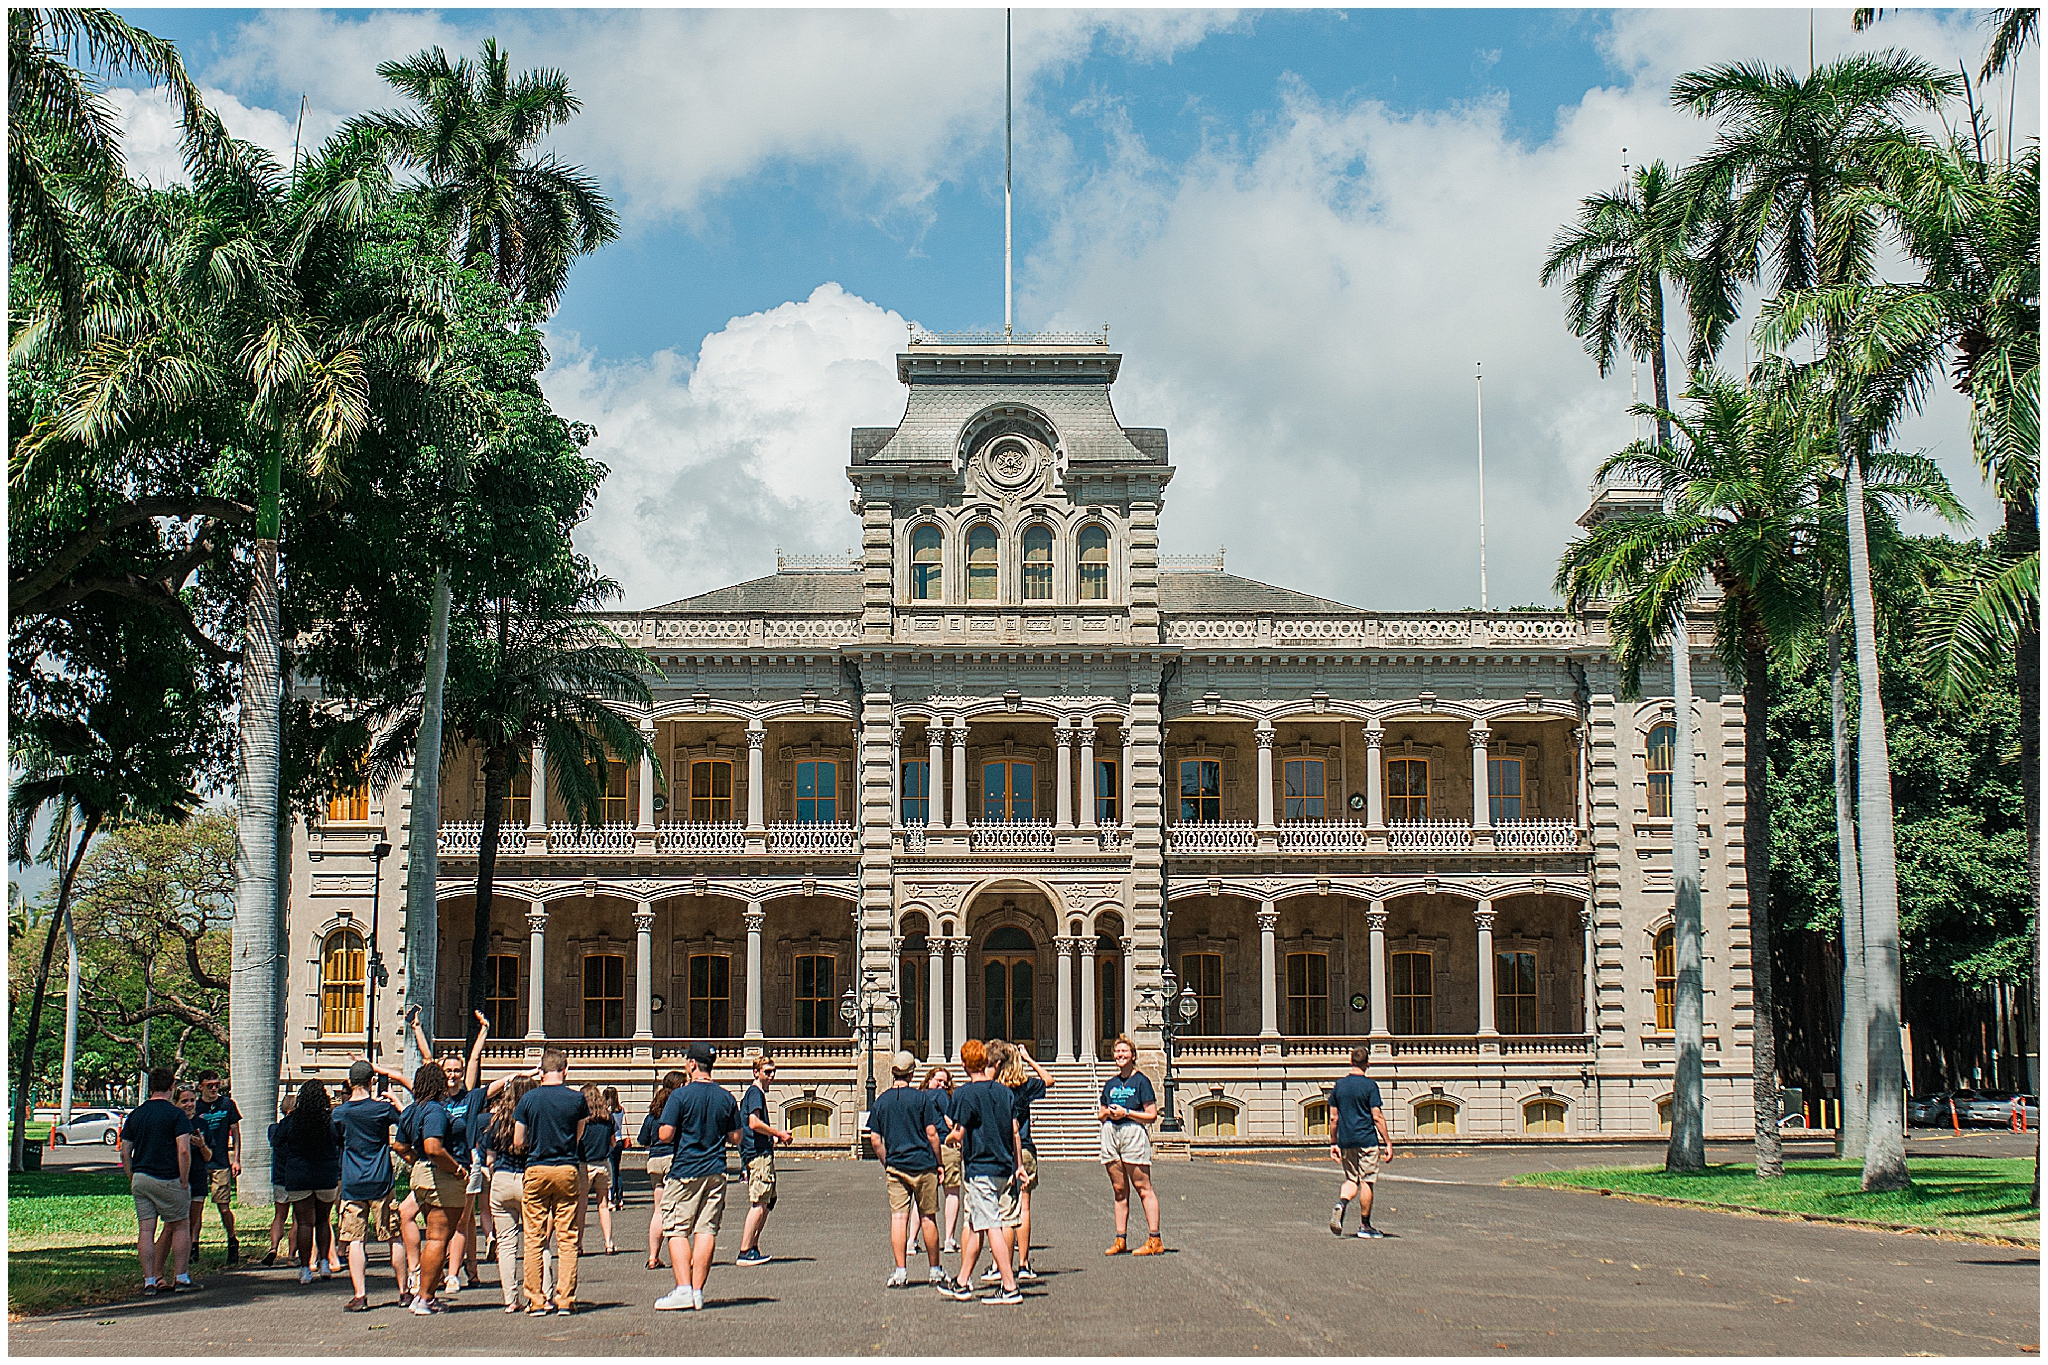 TCR_Hawaii_2019_0016.jpg